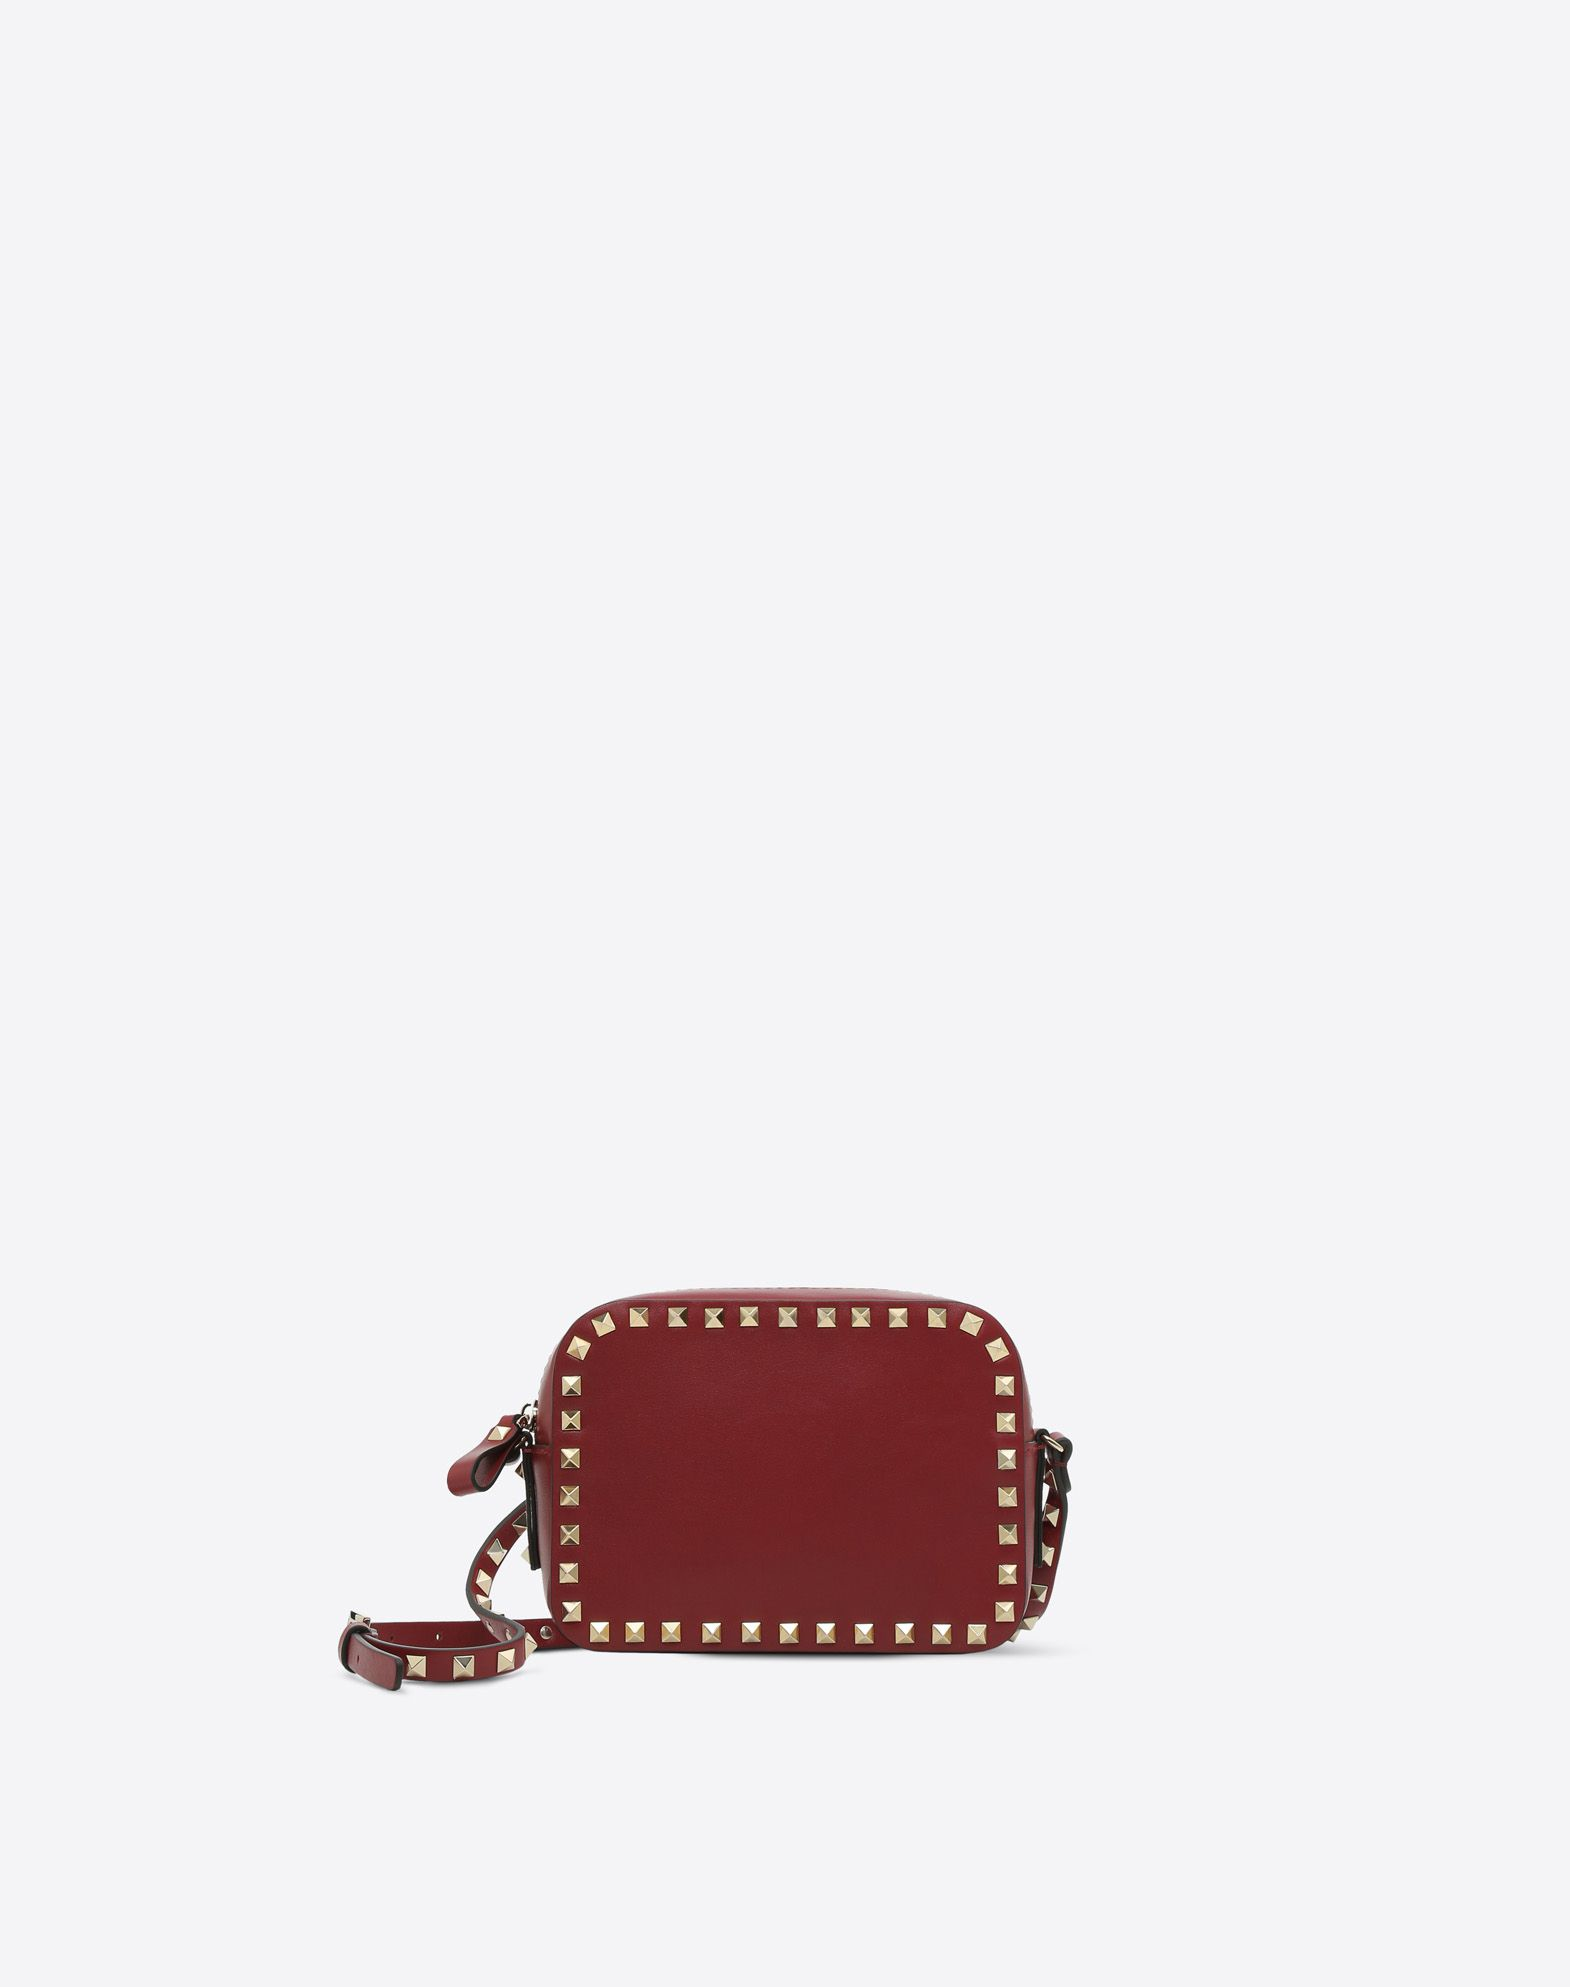 VALENTINO 铆钉 附品牌标志 单色 拉链 可调式背带  45385701ib